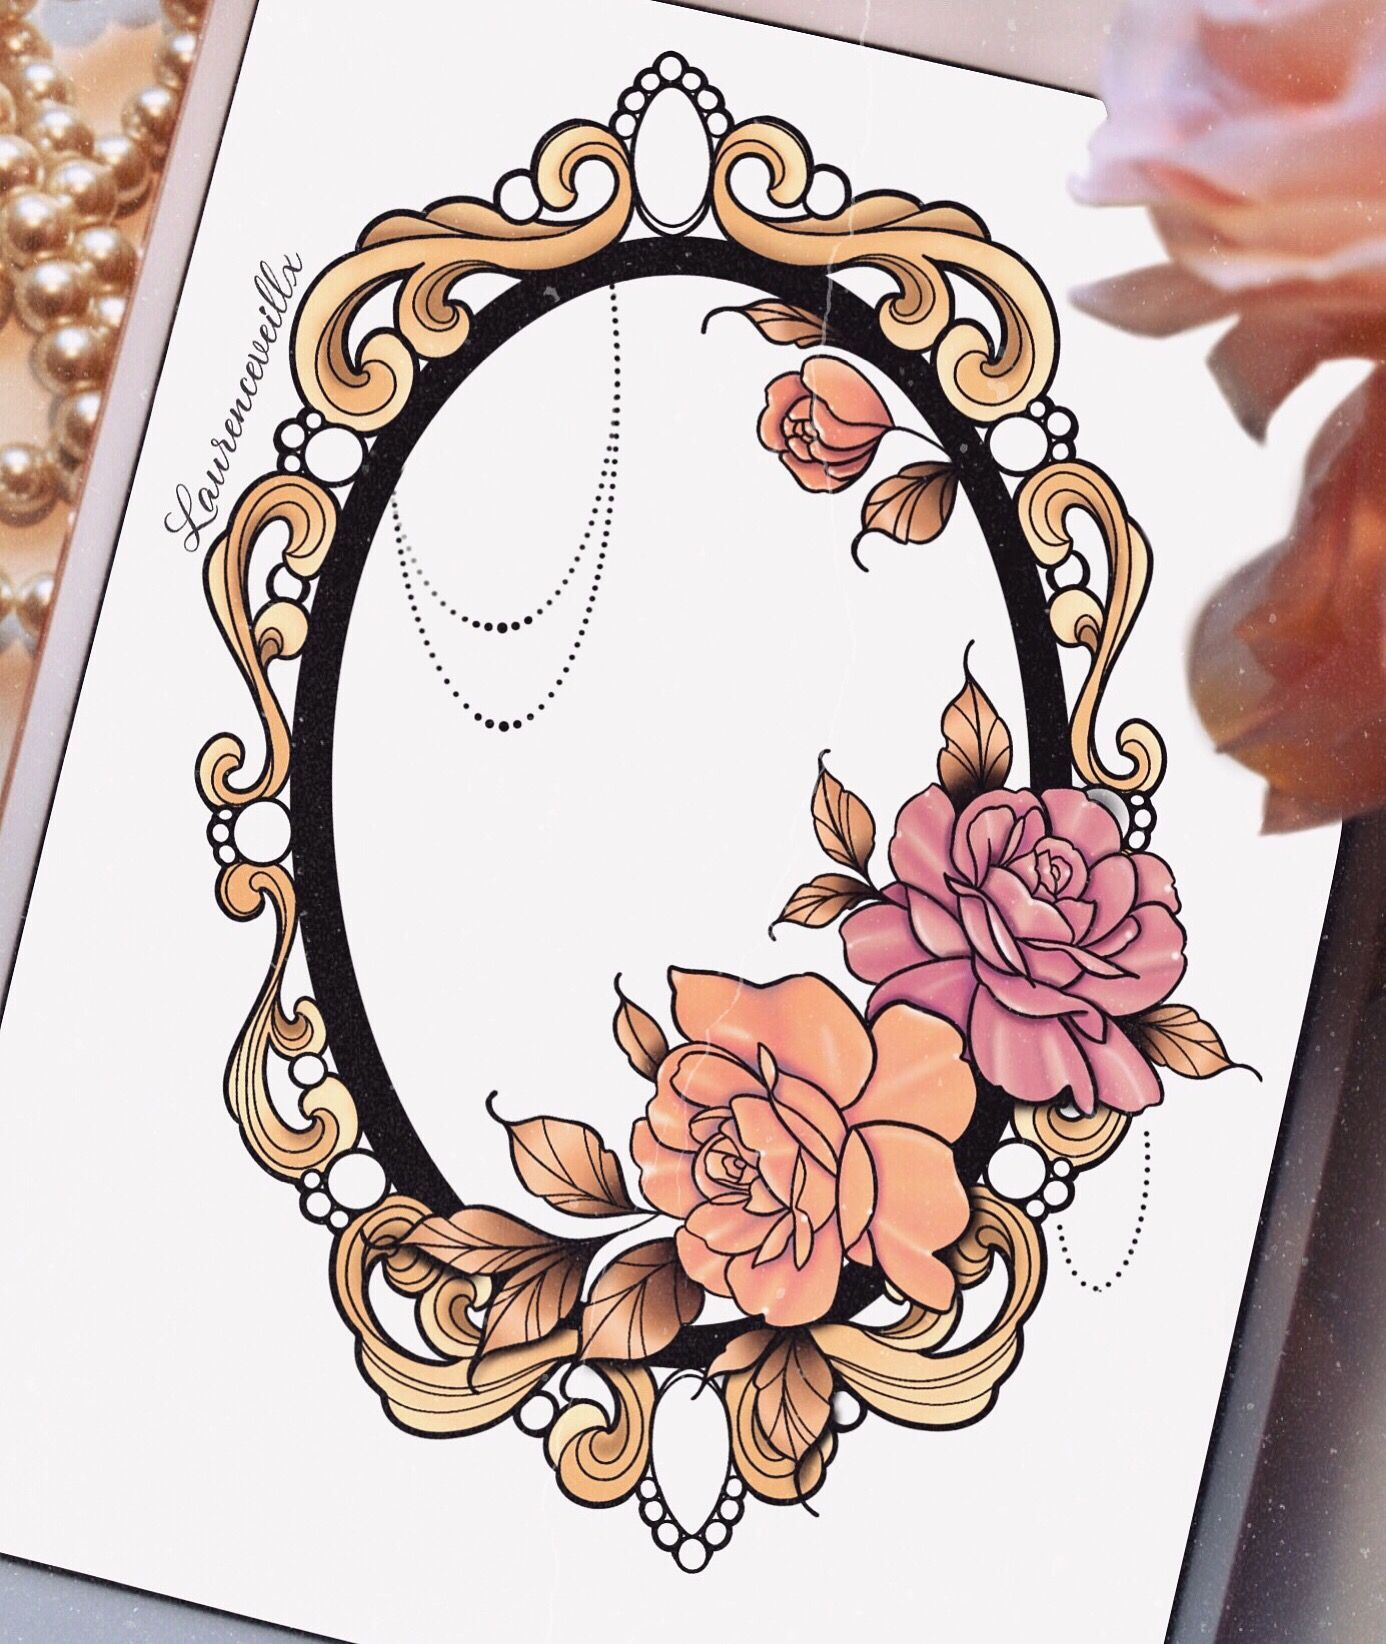 Designideen Flower Gold Neotraditional Roses Spiegel Tattoo Mirror Roses Gold Flower Neotradi In 2020 Neo Traditional Tattoo Framed Tattoo Vintage Mirror Tattoo